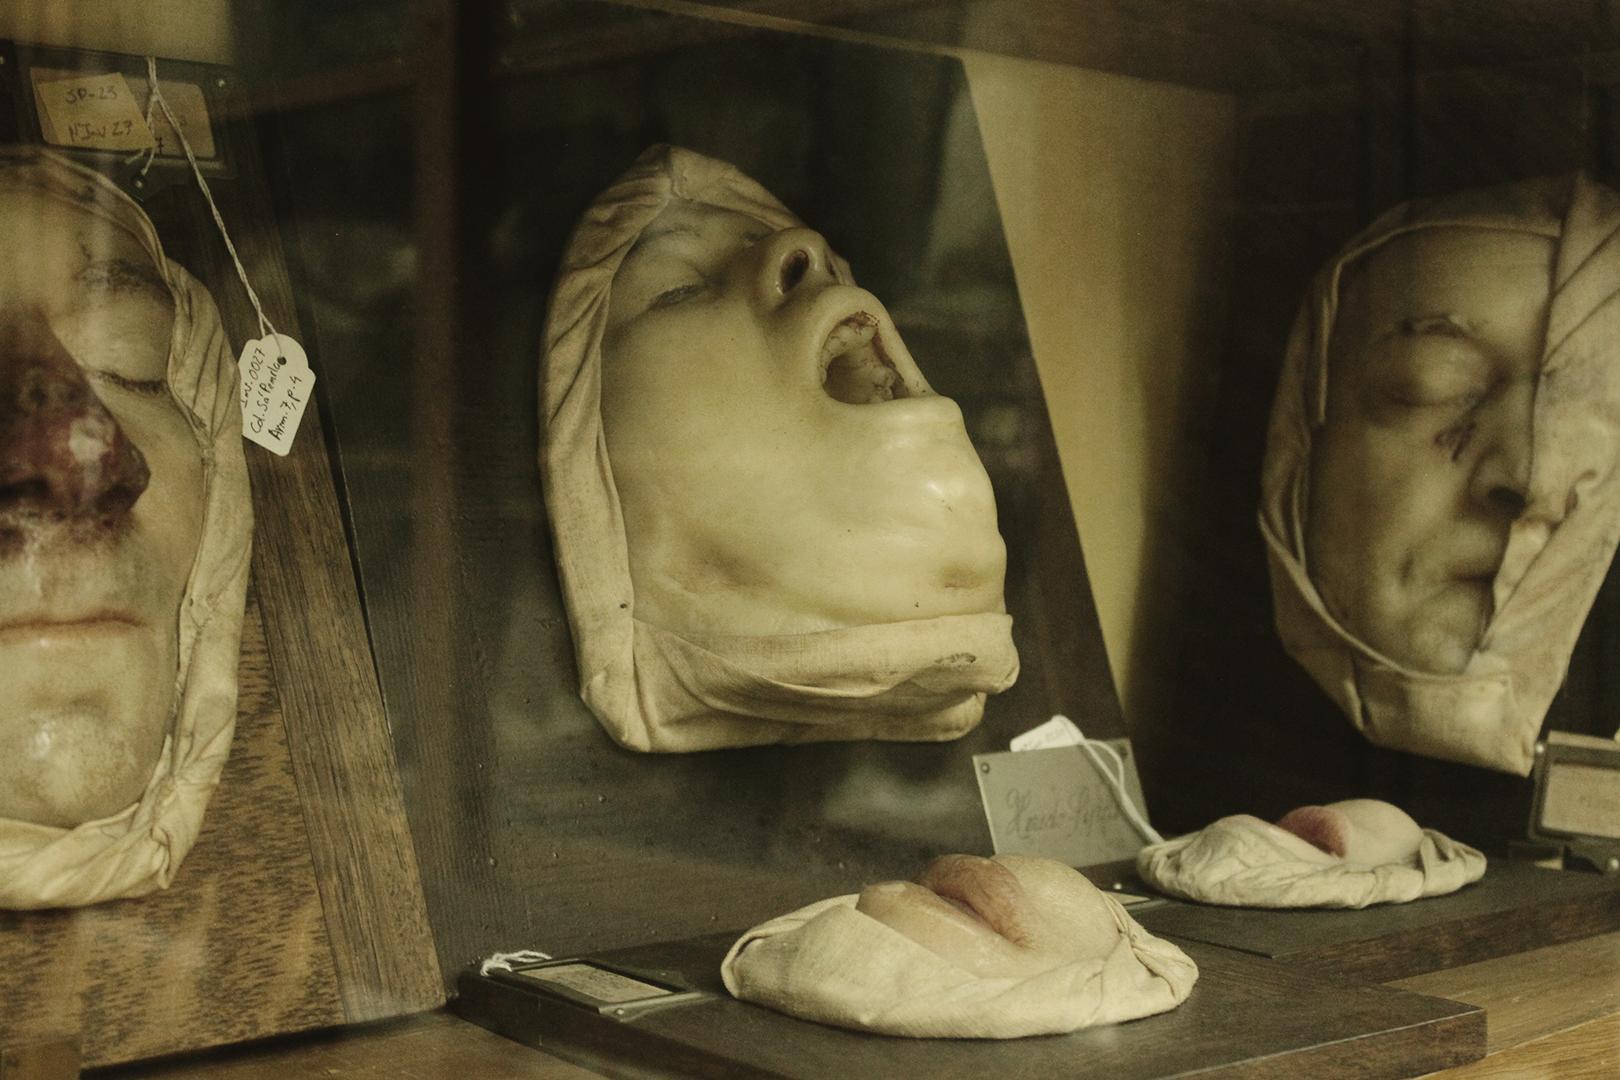 Wax model of congenital syphilis, Museum of Portuguese Dermatology (Museu da Dermatologia Portuguesa).